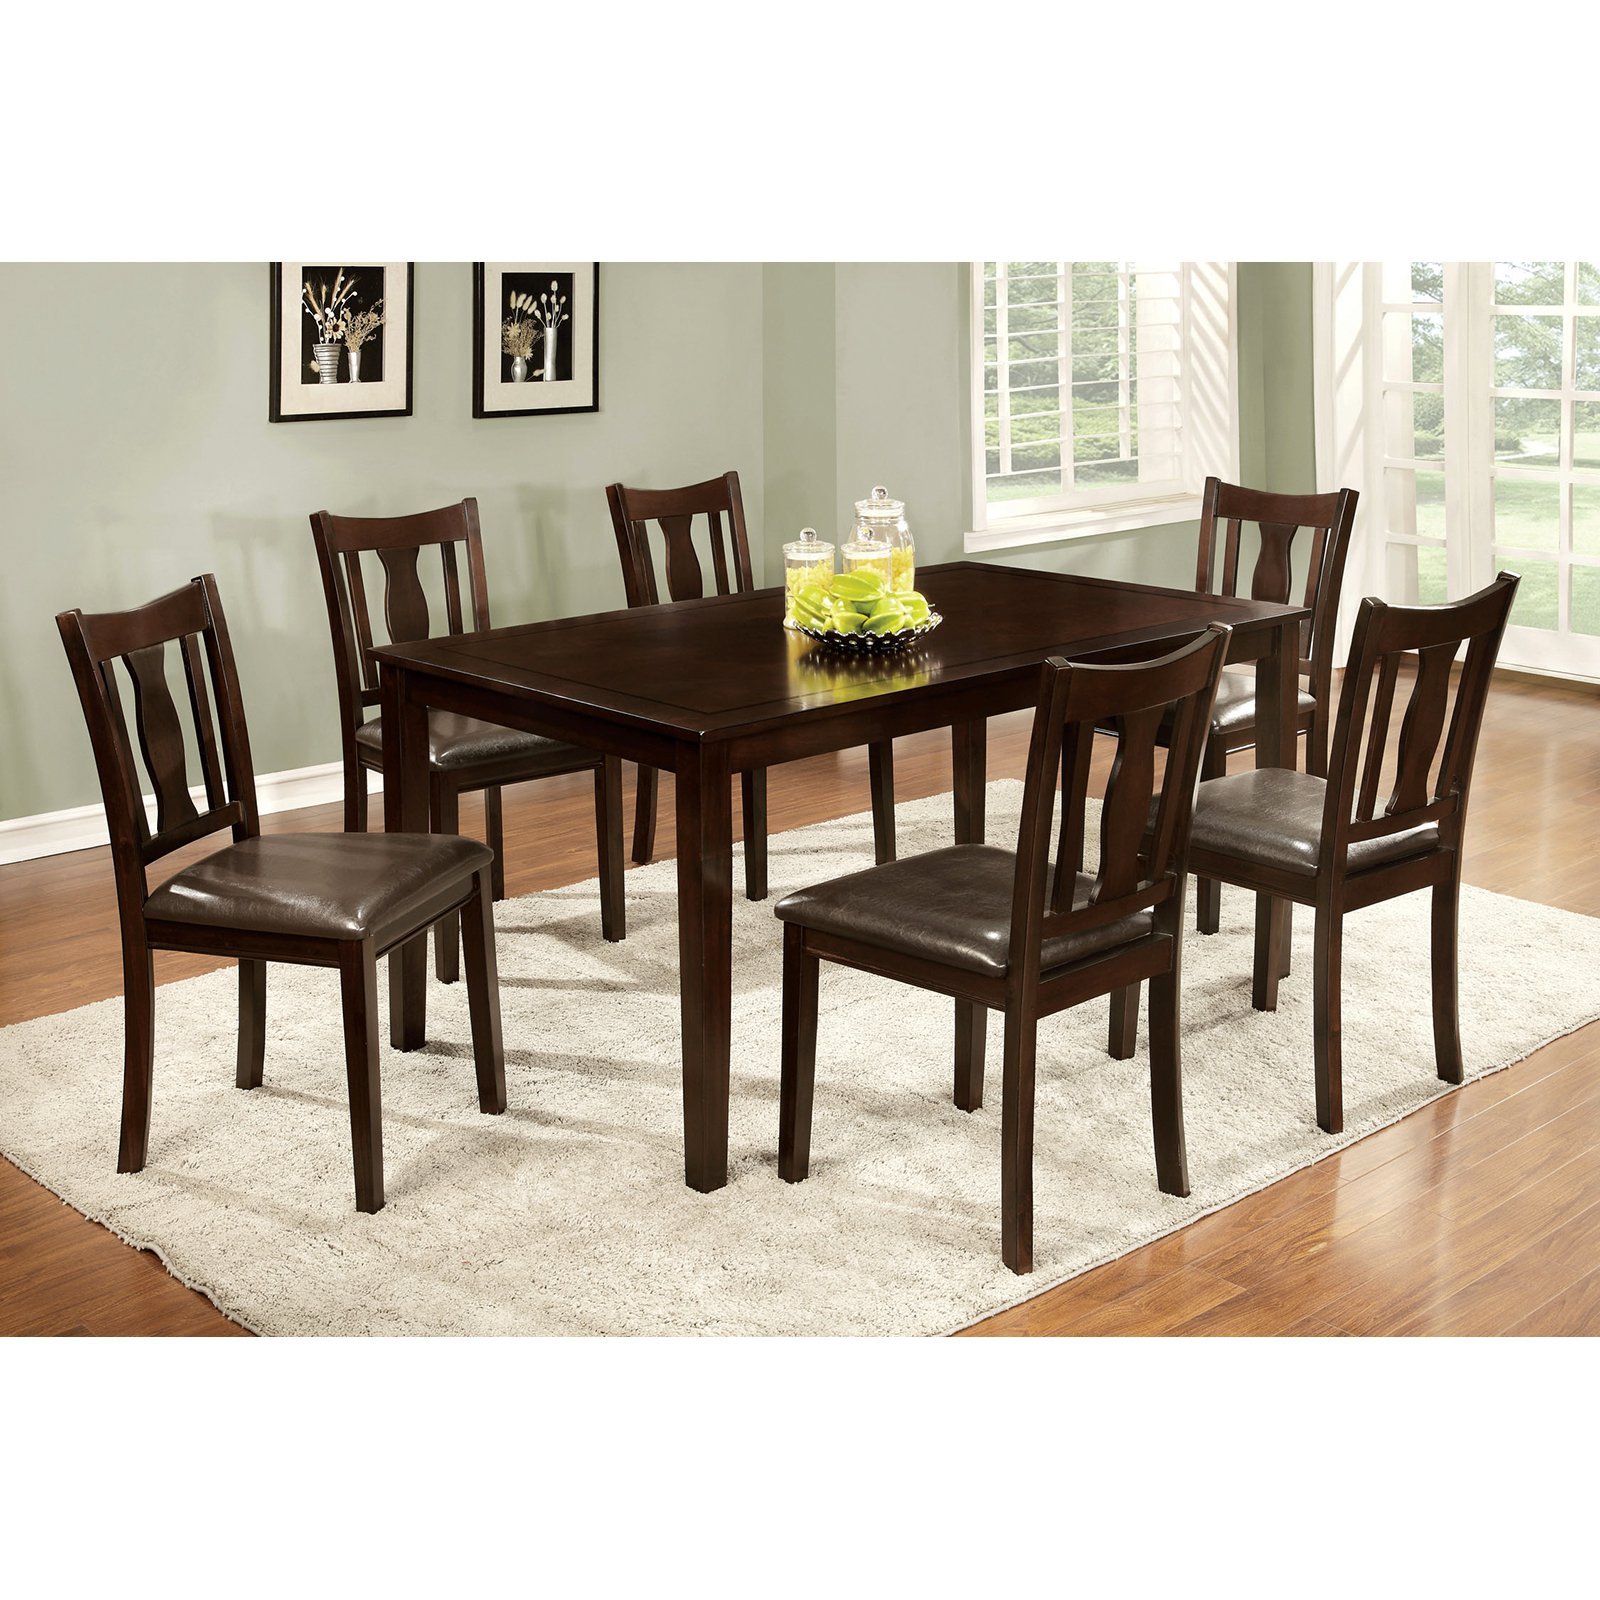 Furniture of America Chargon 7 Piece Dining Set - Espresso